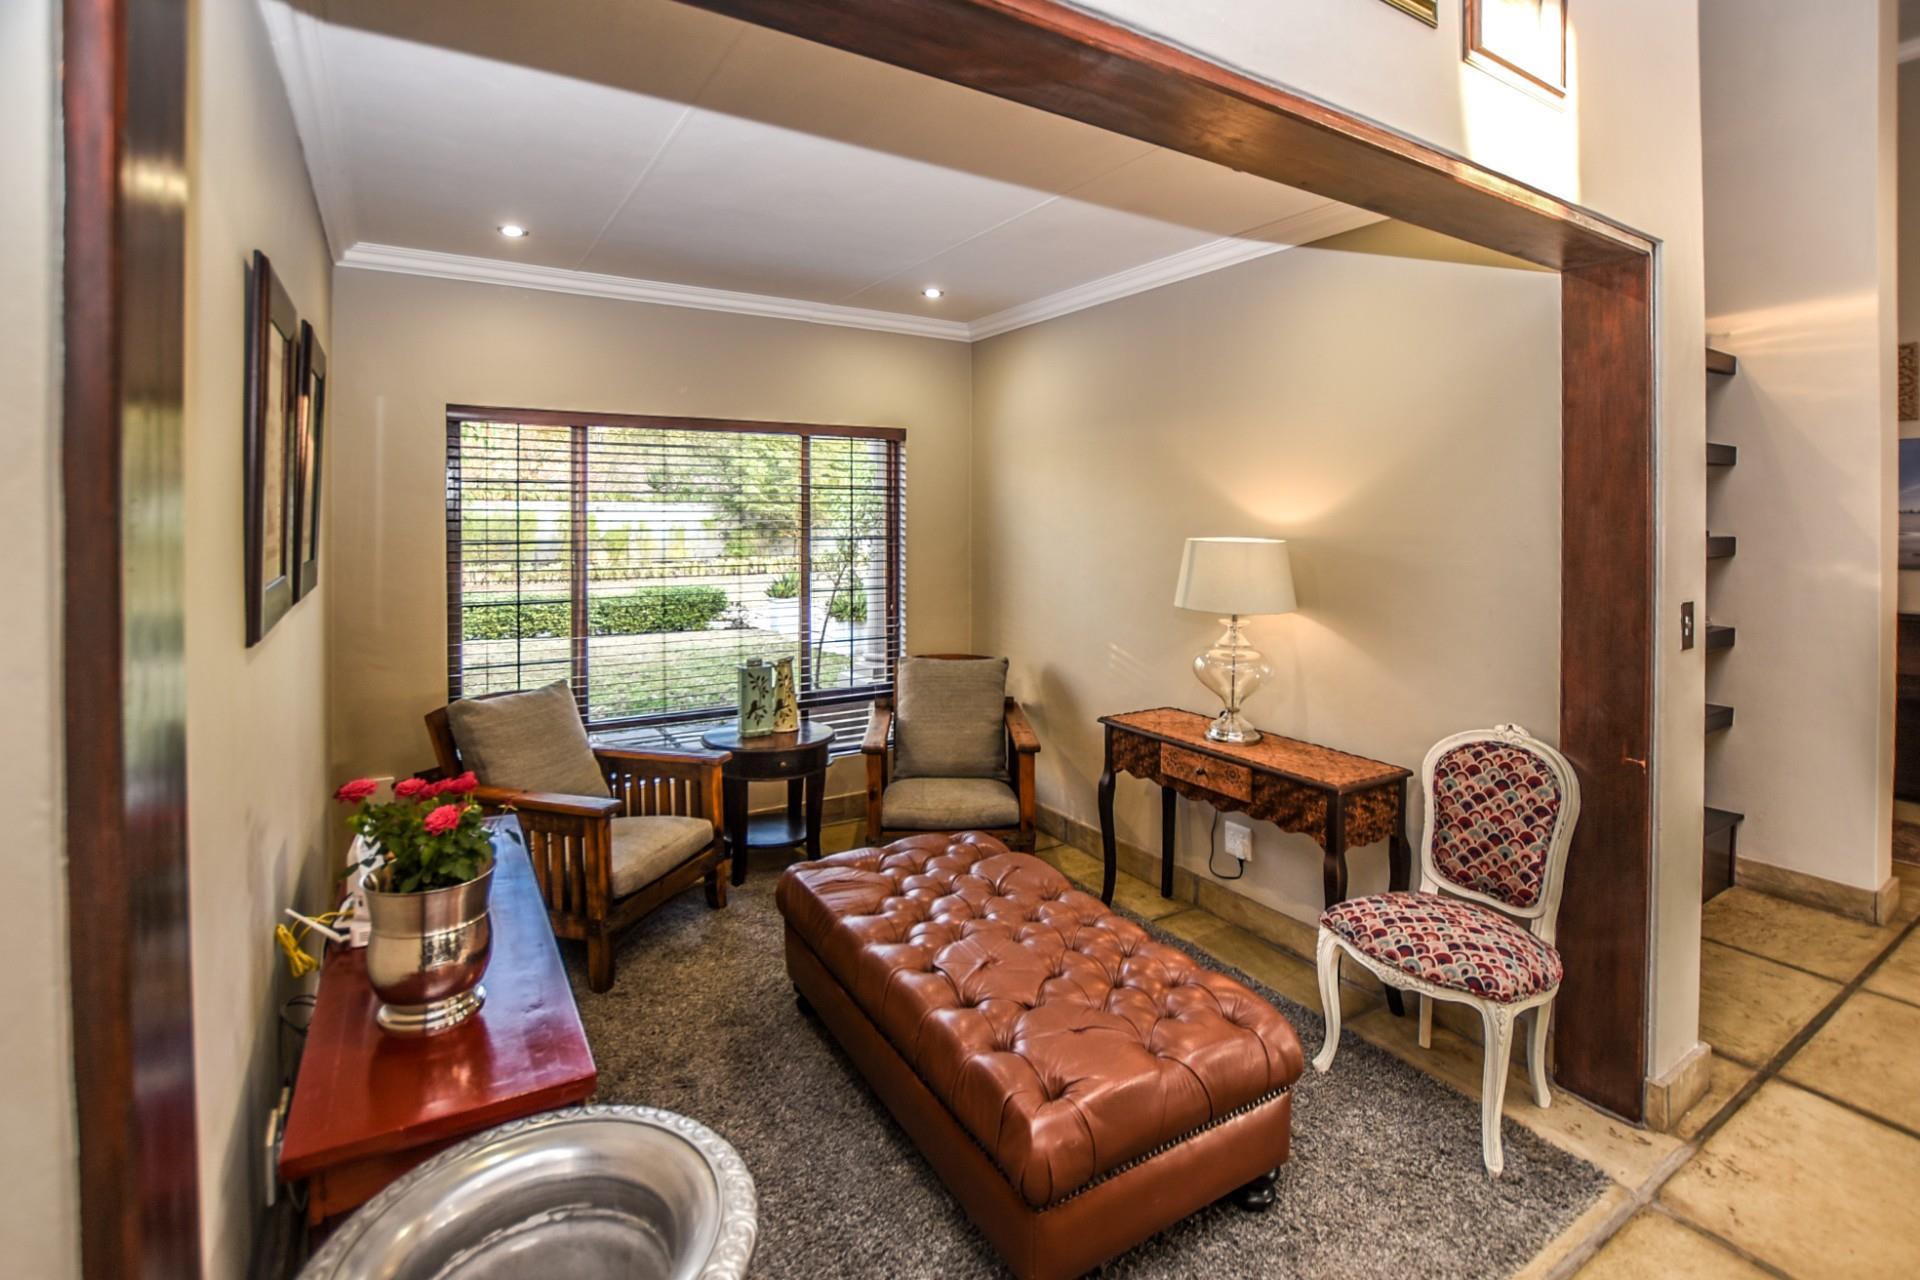 4 Bedroom House For Sale in Shandon Estate